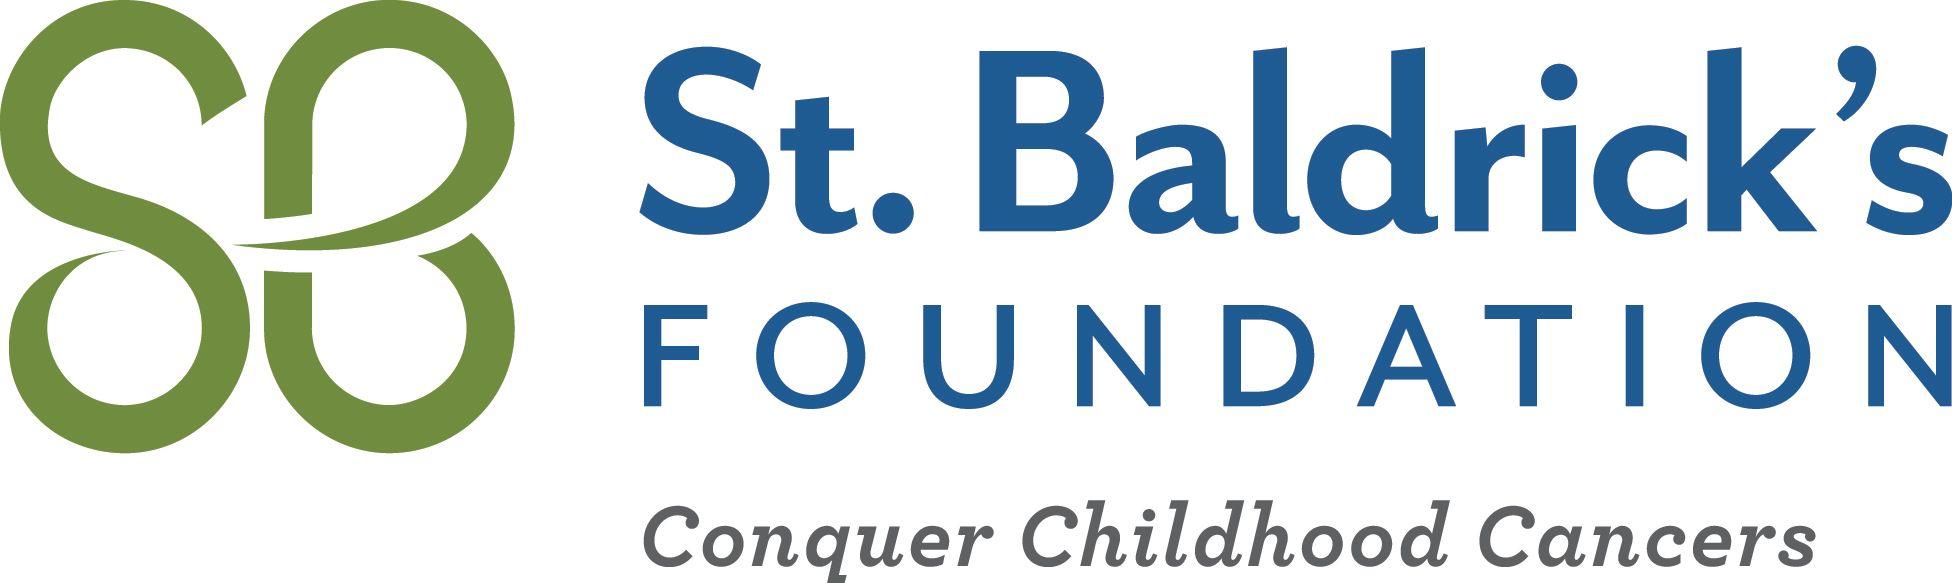 St. Baldrick's Foundation